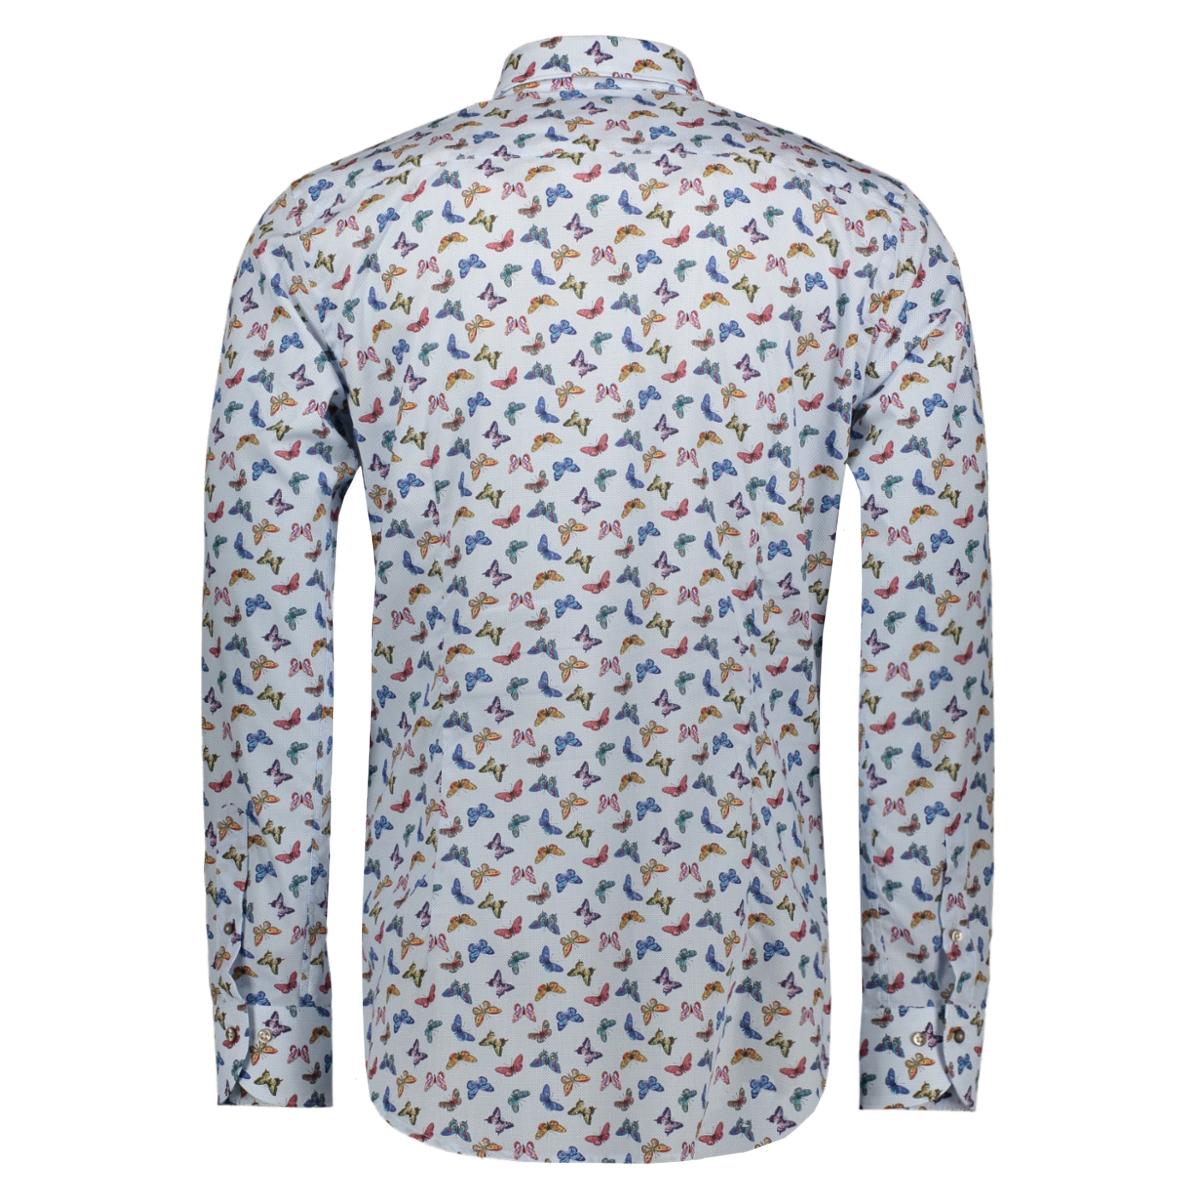 21 20sh050 5 marnelli overhemd 304